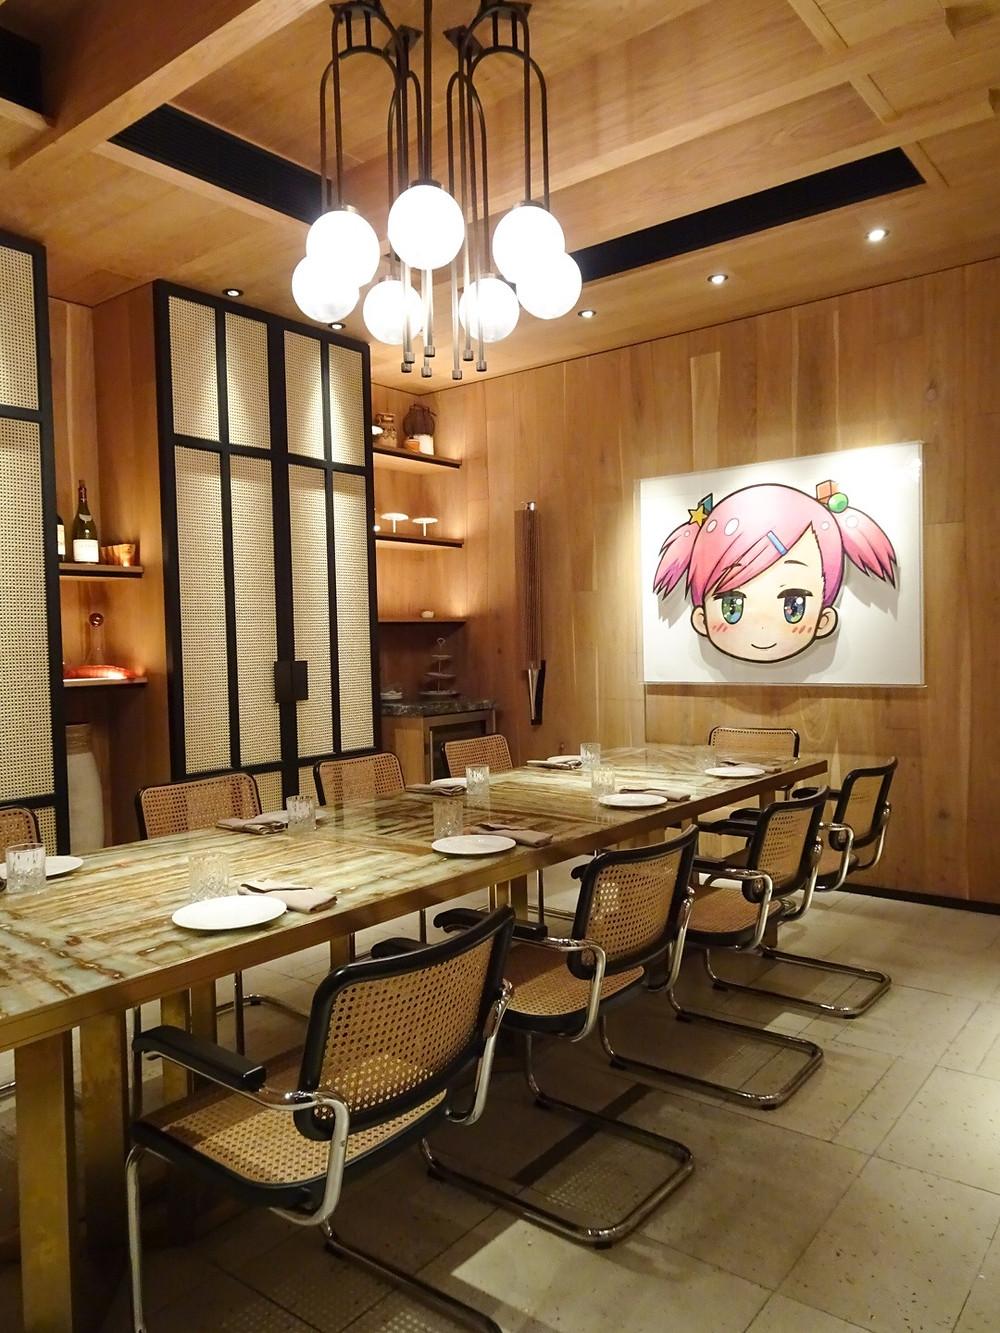 La Rambla restaurant in Hong Kong